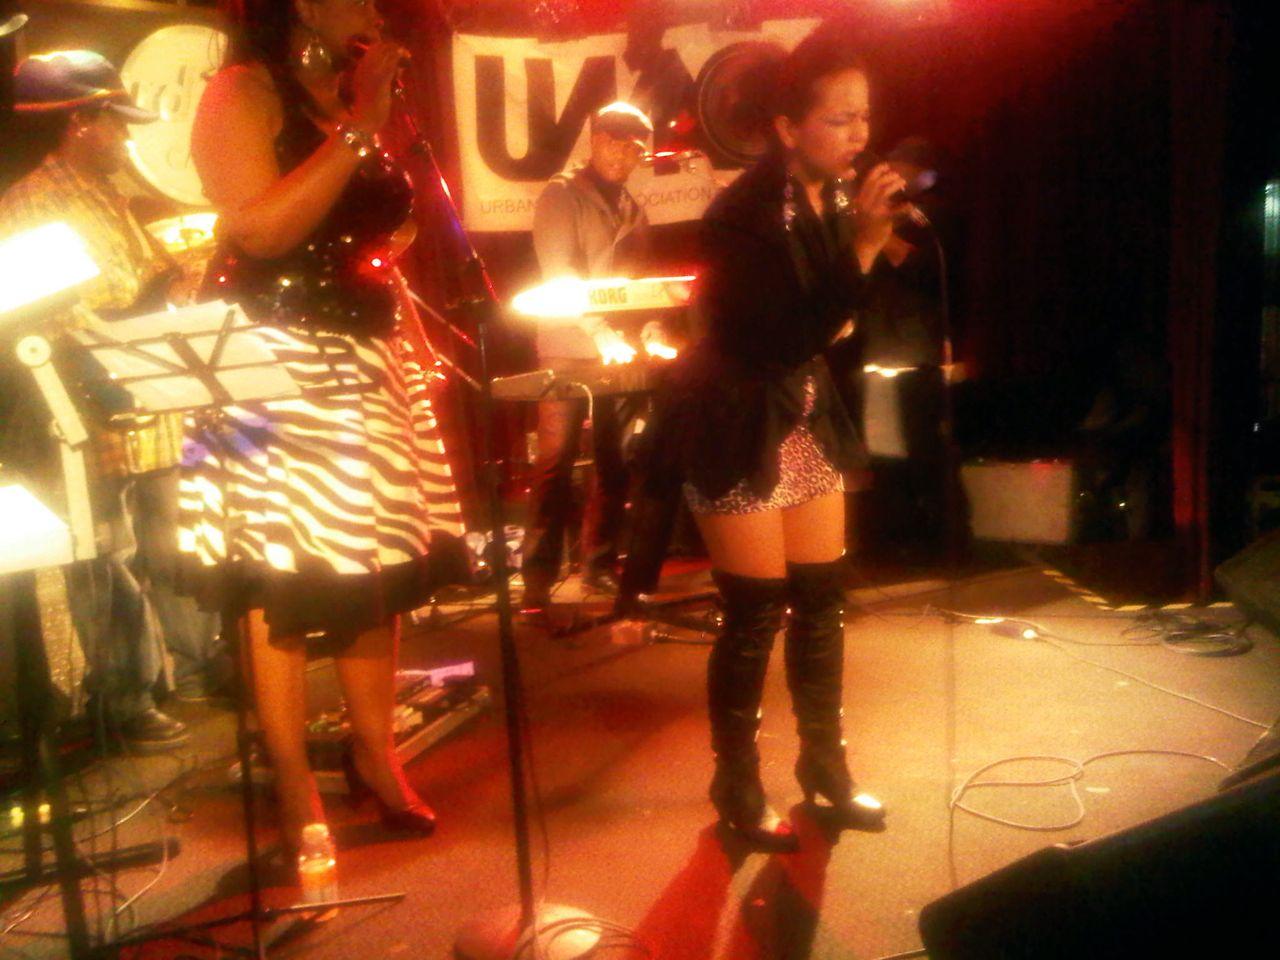 TolumiDE My Love Promo Tour Toronto Canada 2011 - 20